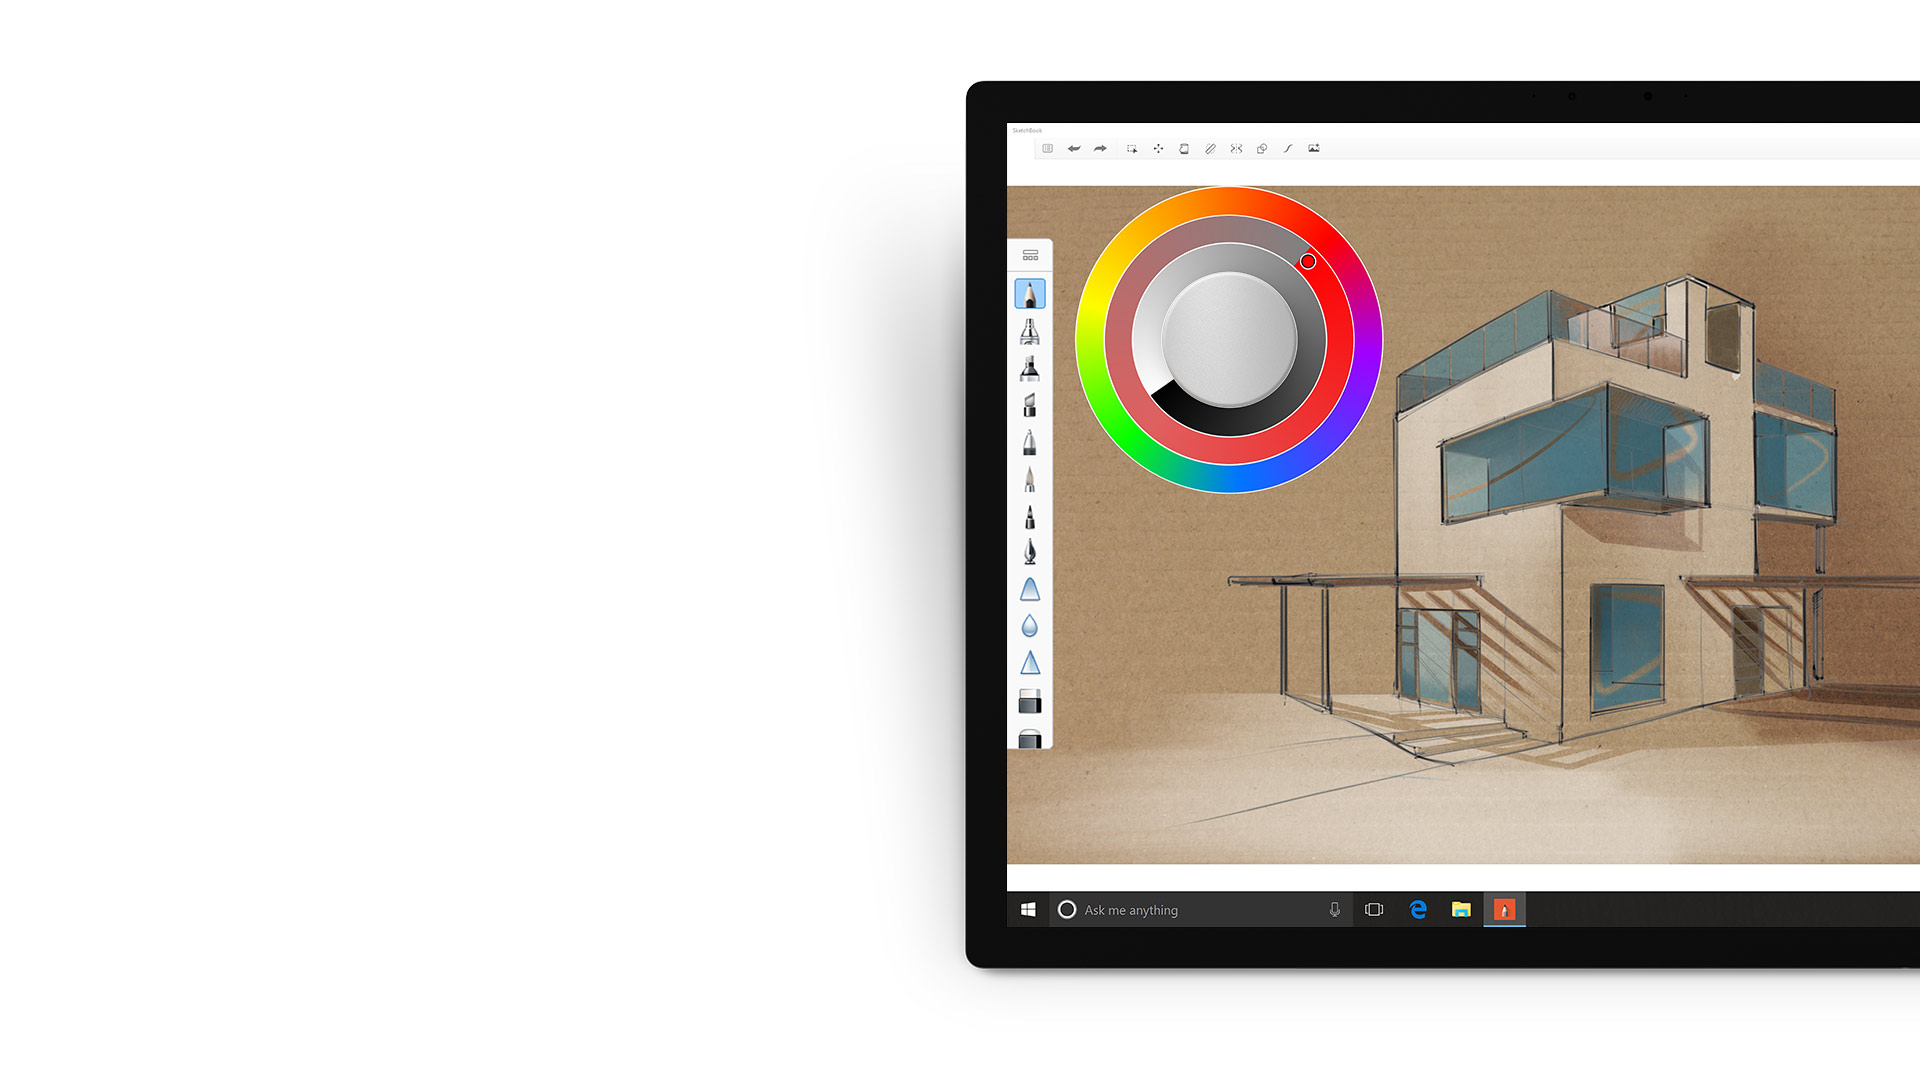 SketchBook app on Surface device.